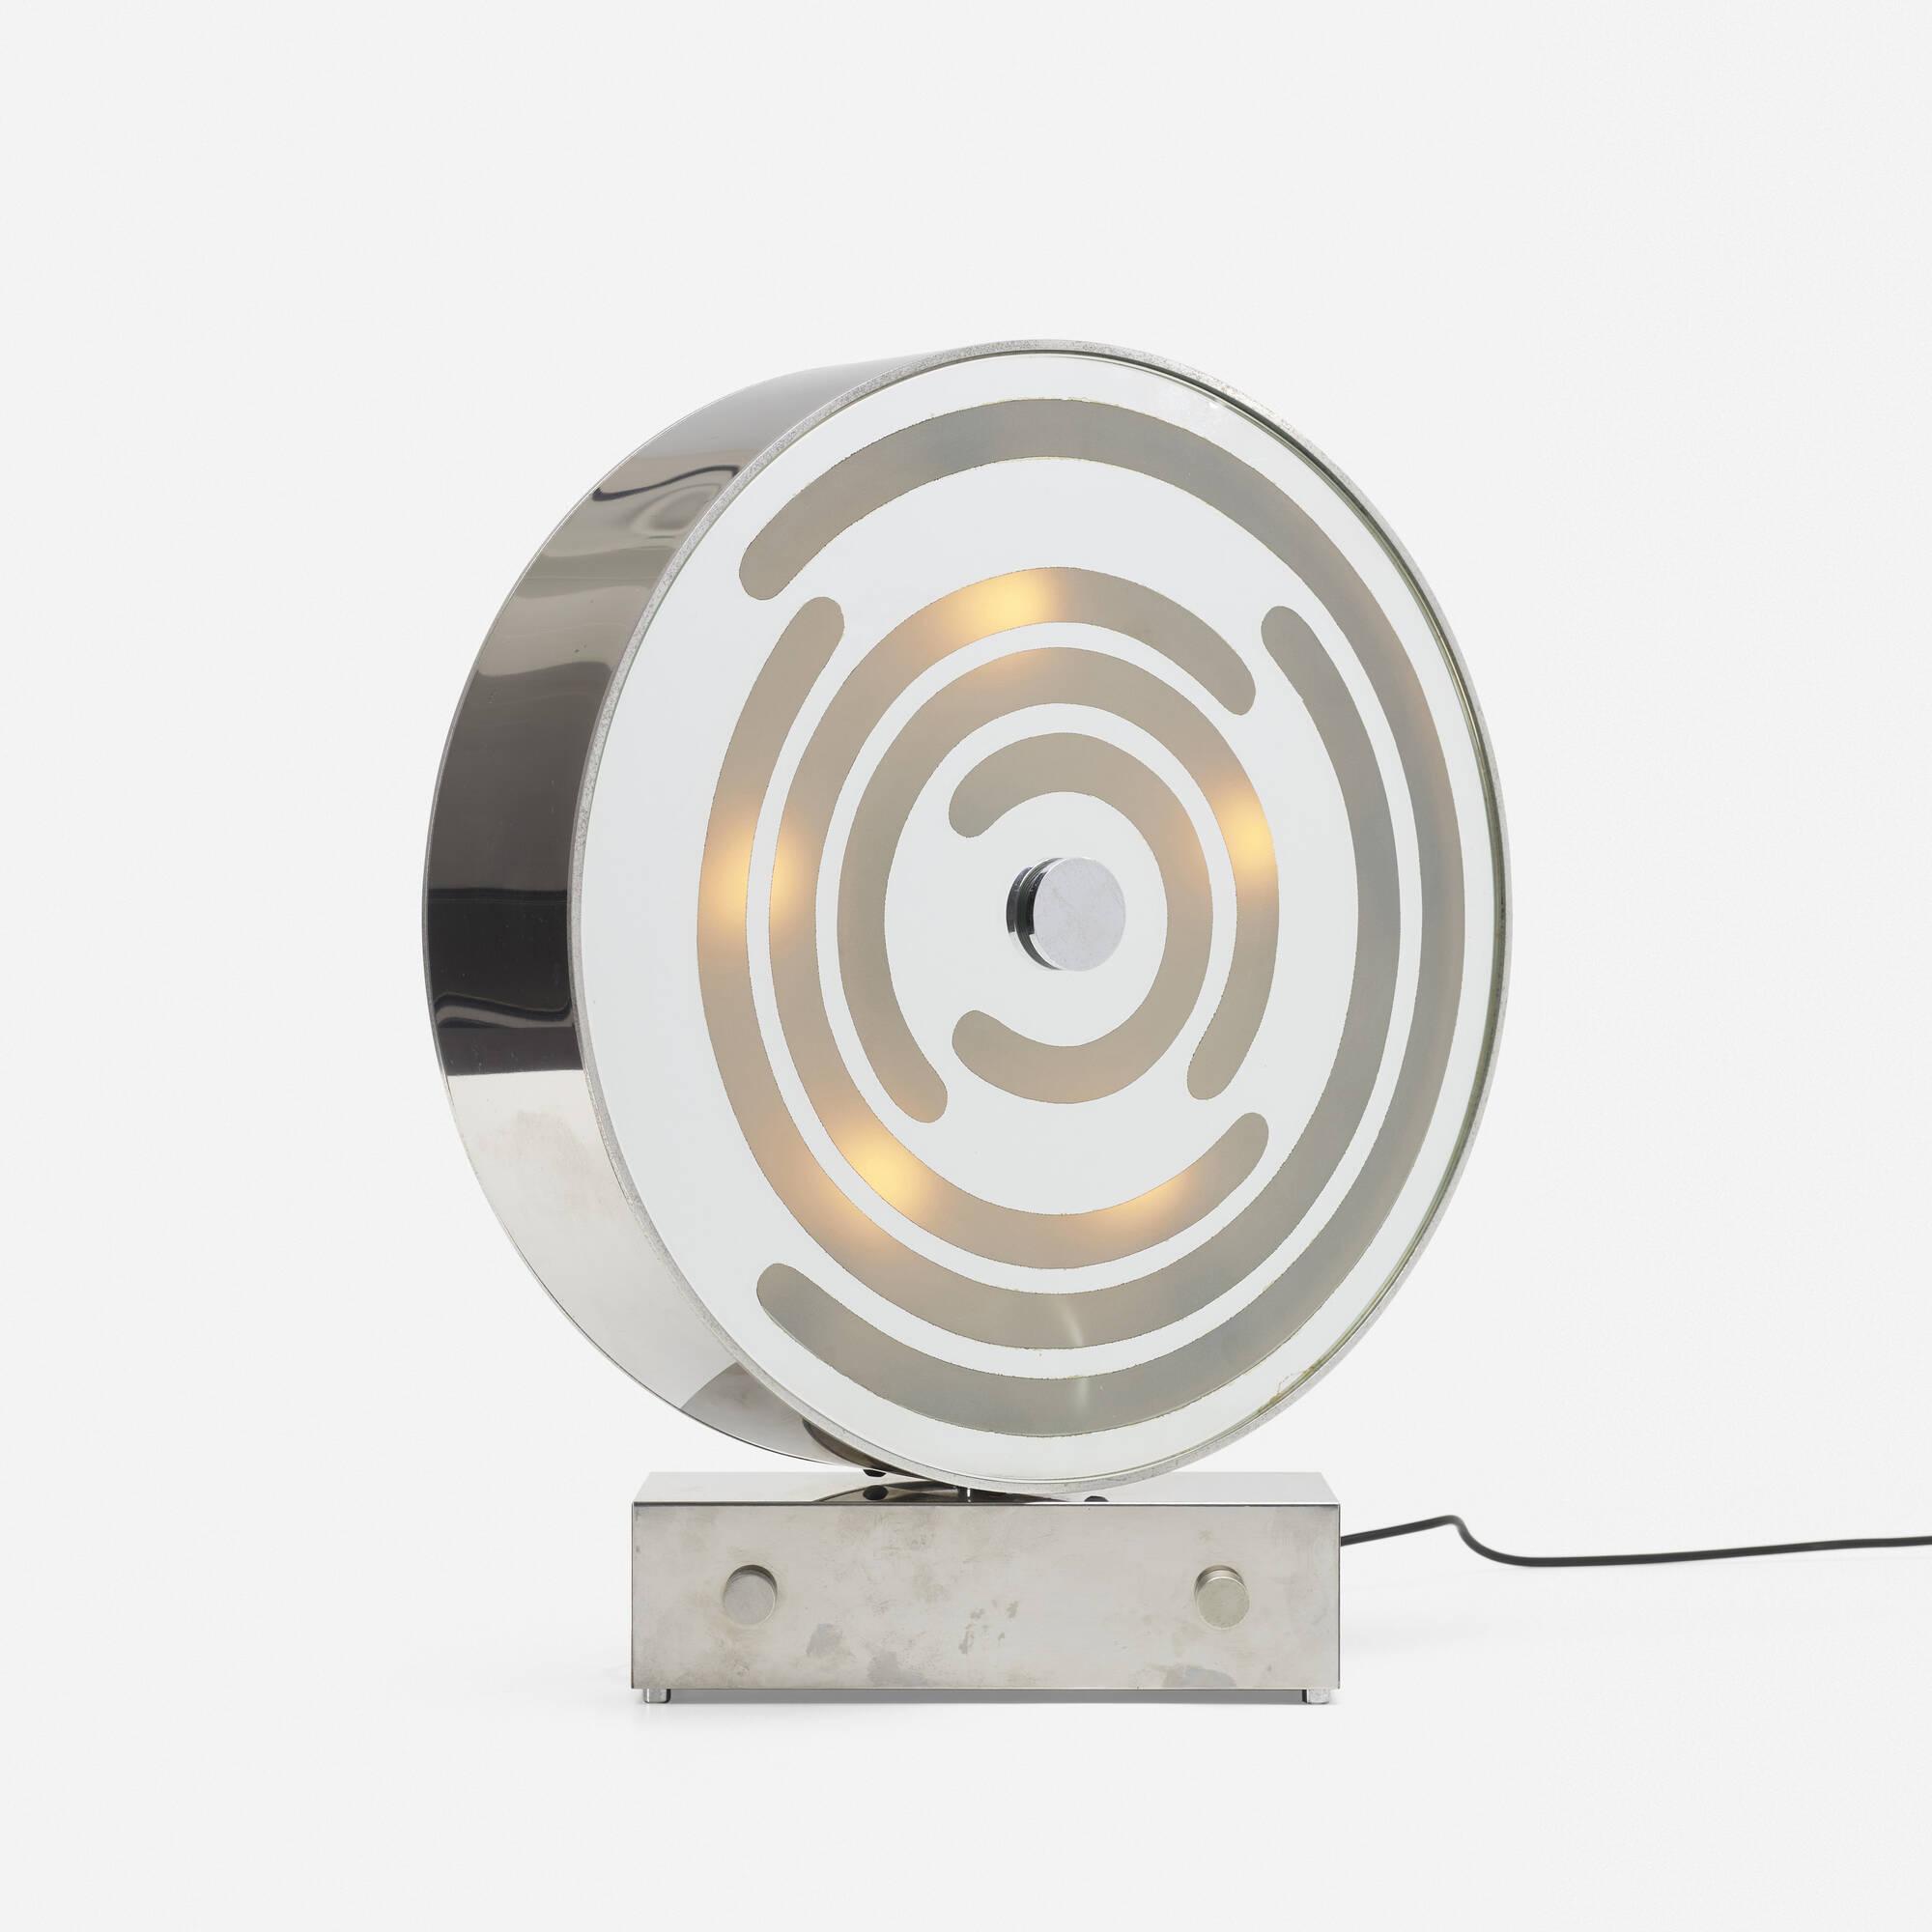 303: Innocente Gandini / Sunlight table lamp (2 of 5)